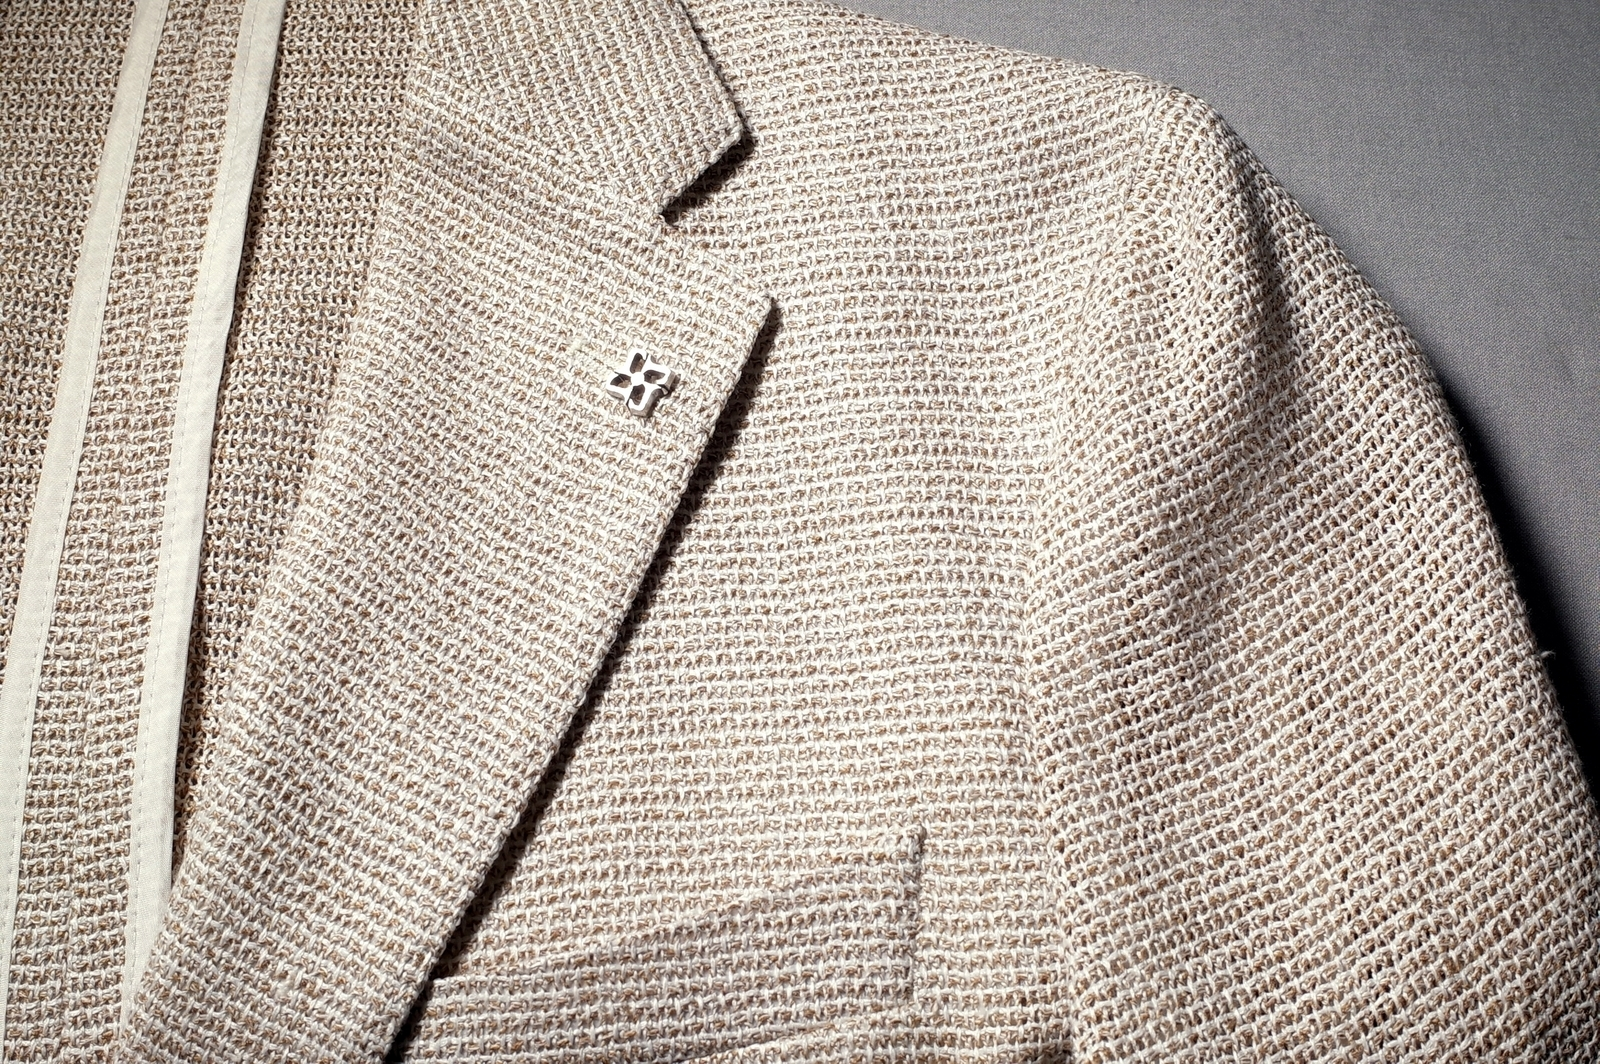 f:id:suits:20200719230003j:plain